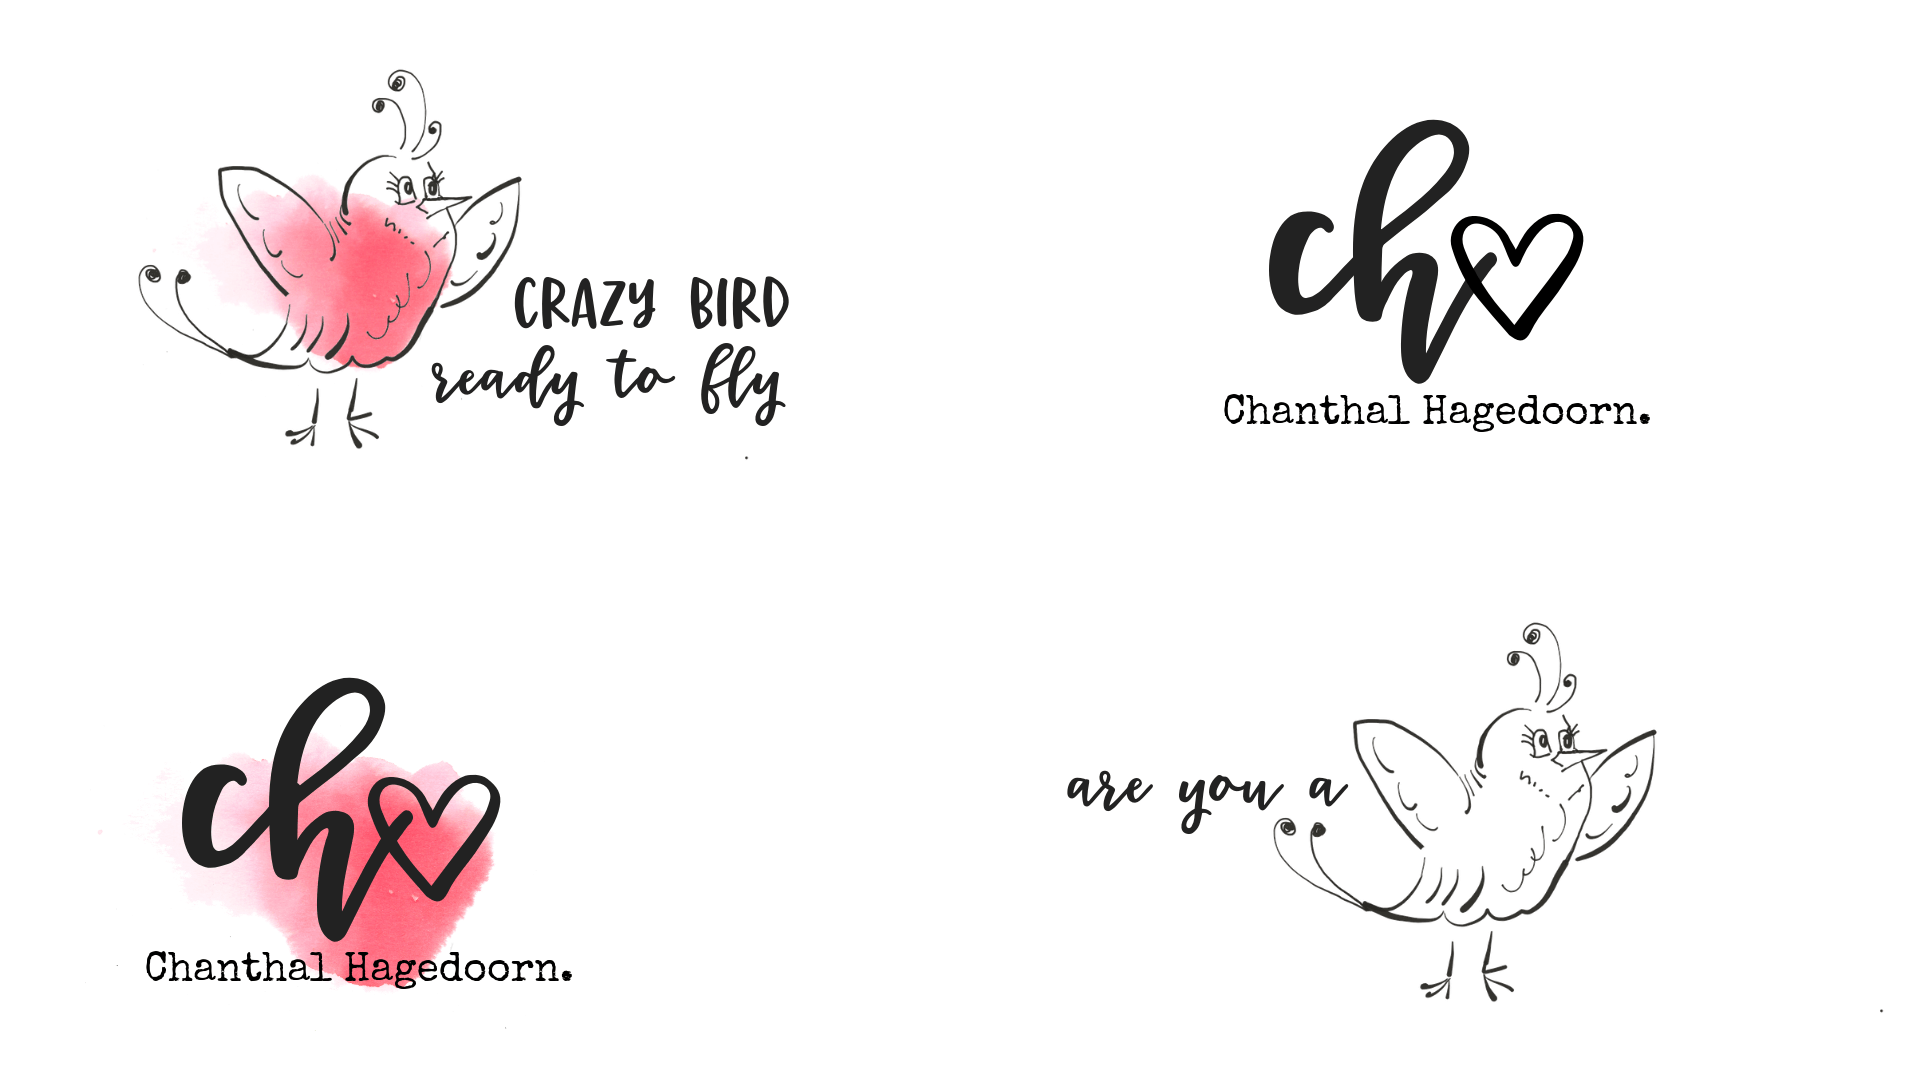 logo en beeldmerk rebranding chanthal hagedoorn (1)